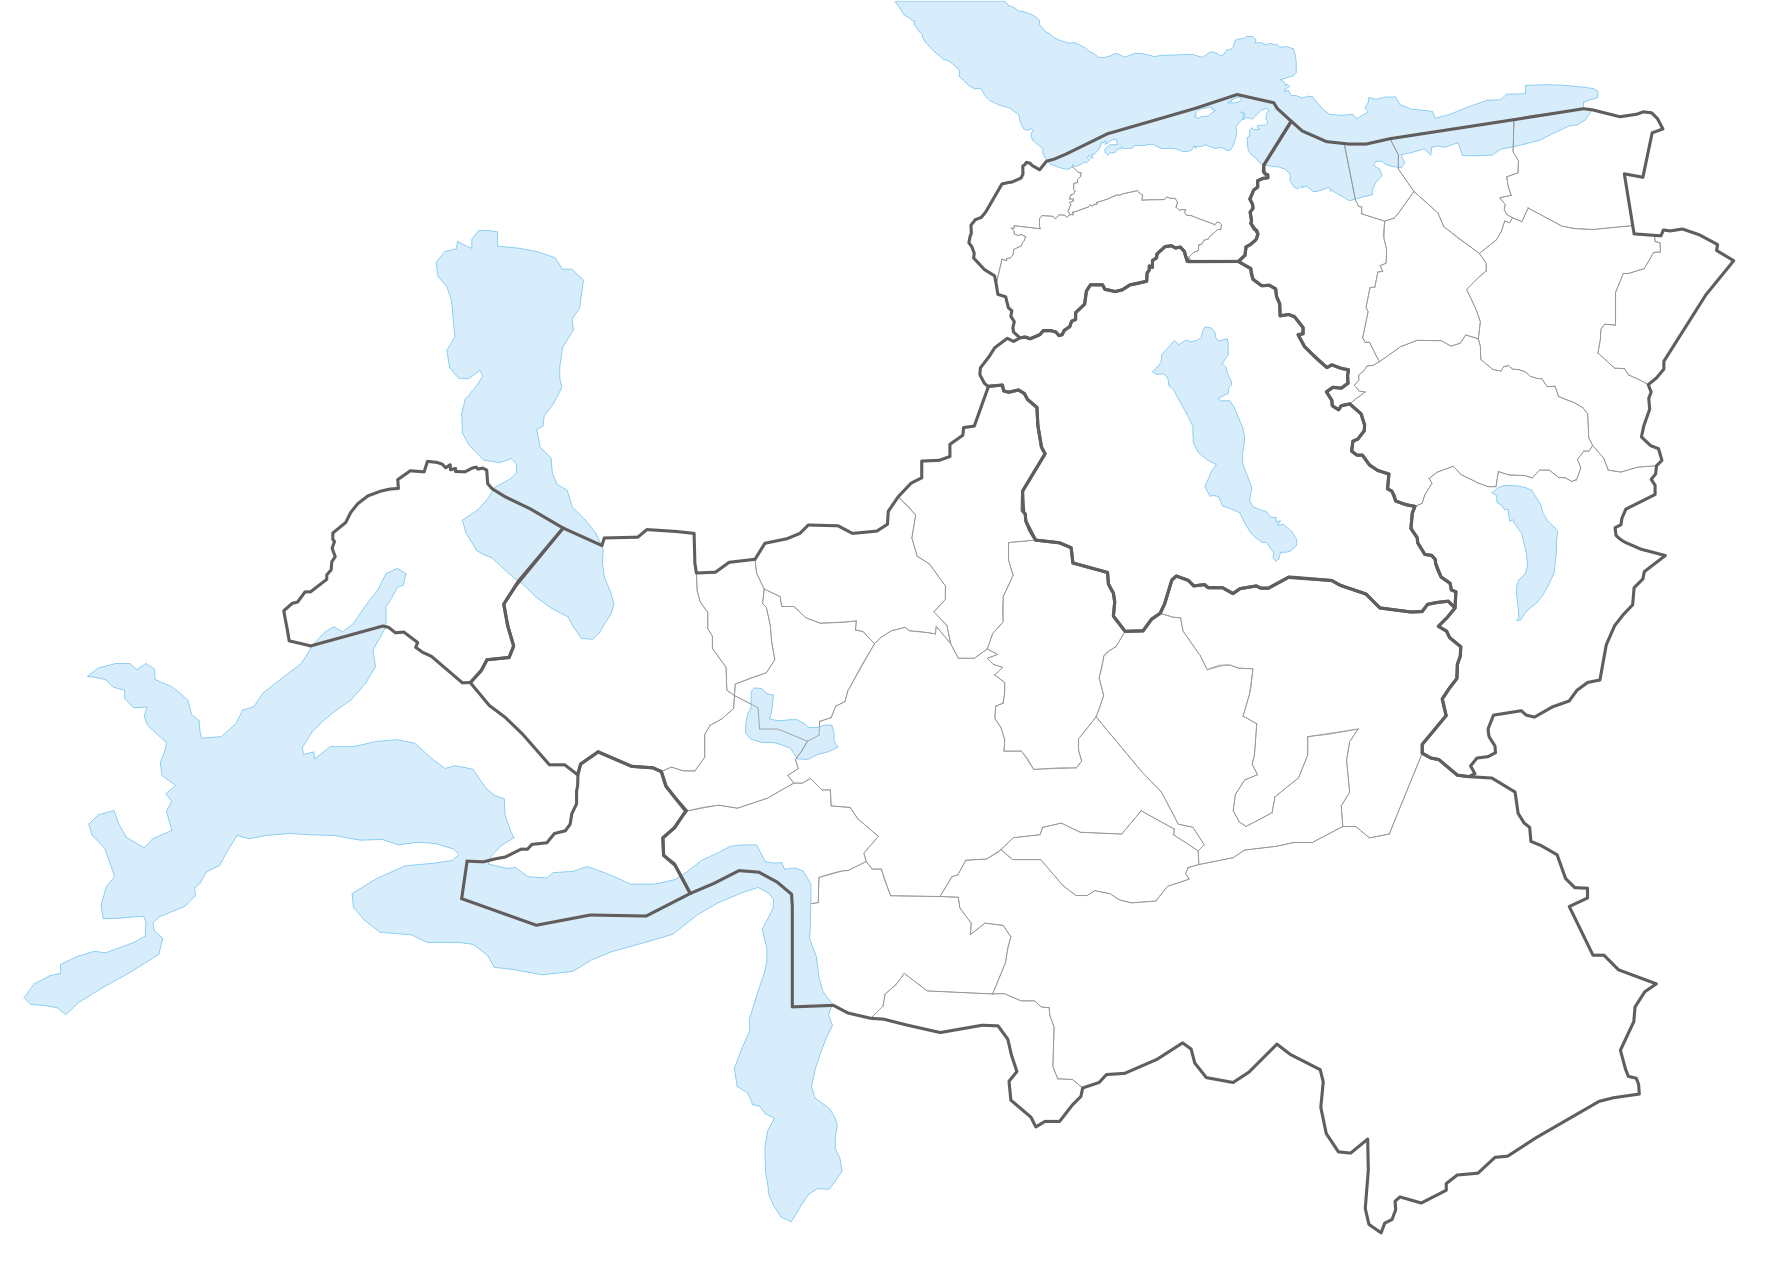 FileKarte Gemeinden des Kantons Schwyz 2007png Wikimedia Commons